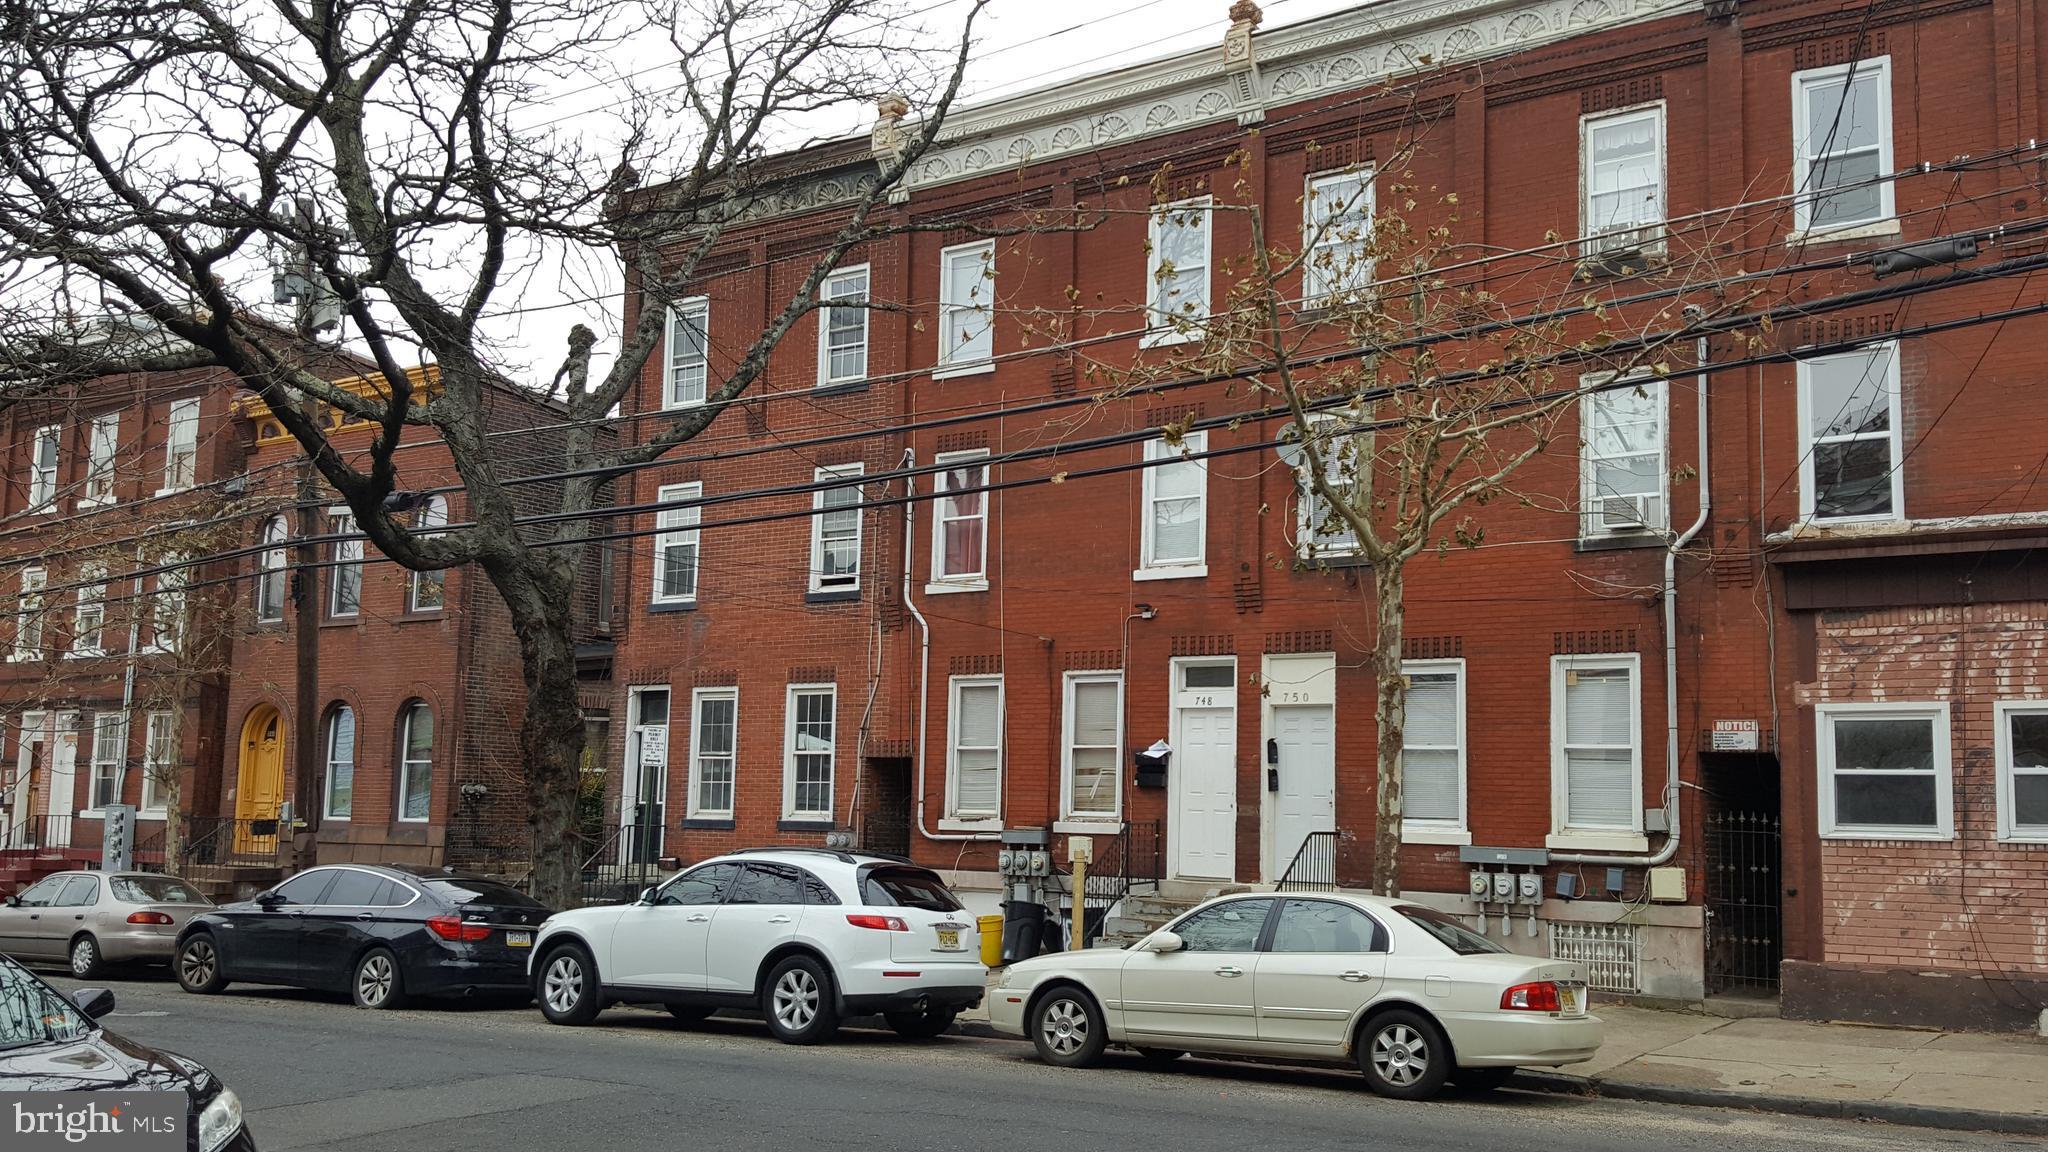 748 CENTRE STREET, TRENTON, NJ 08611